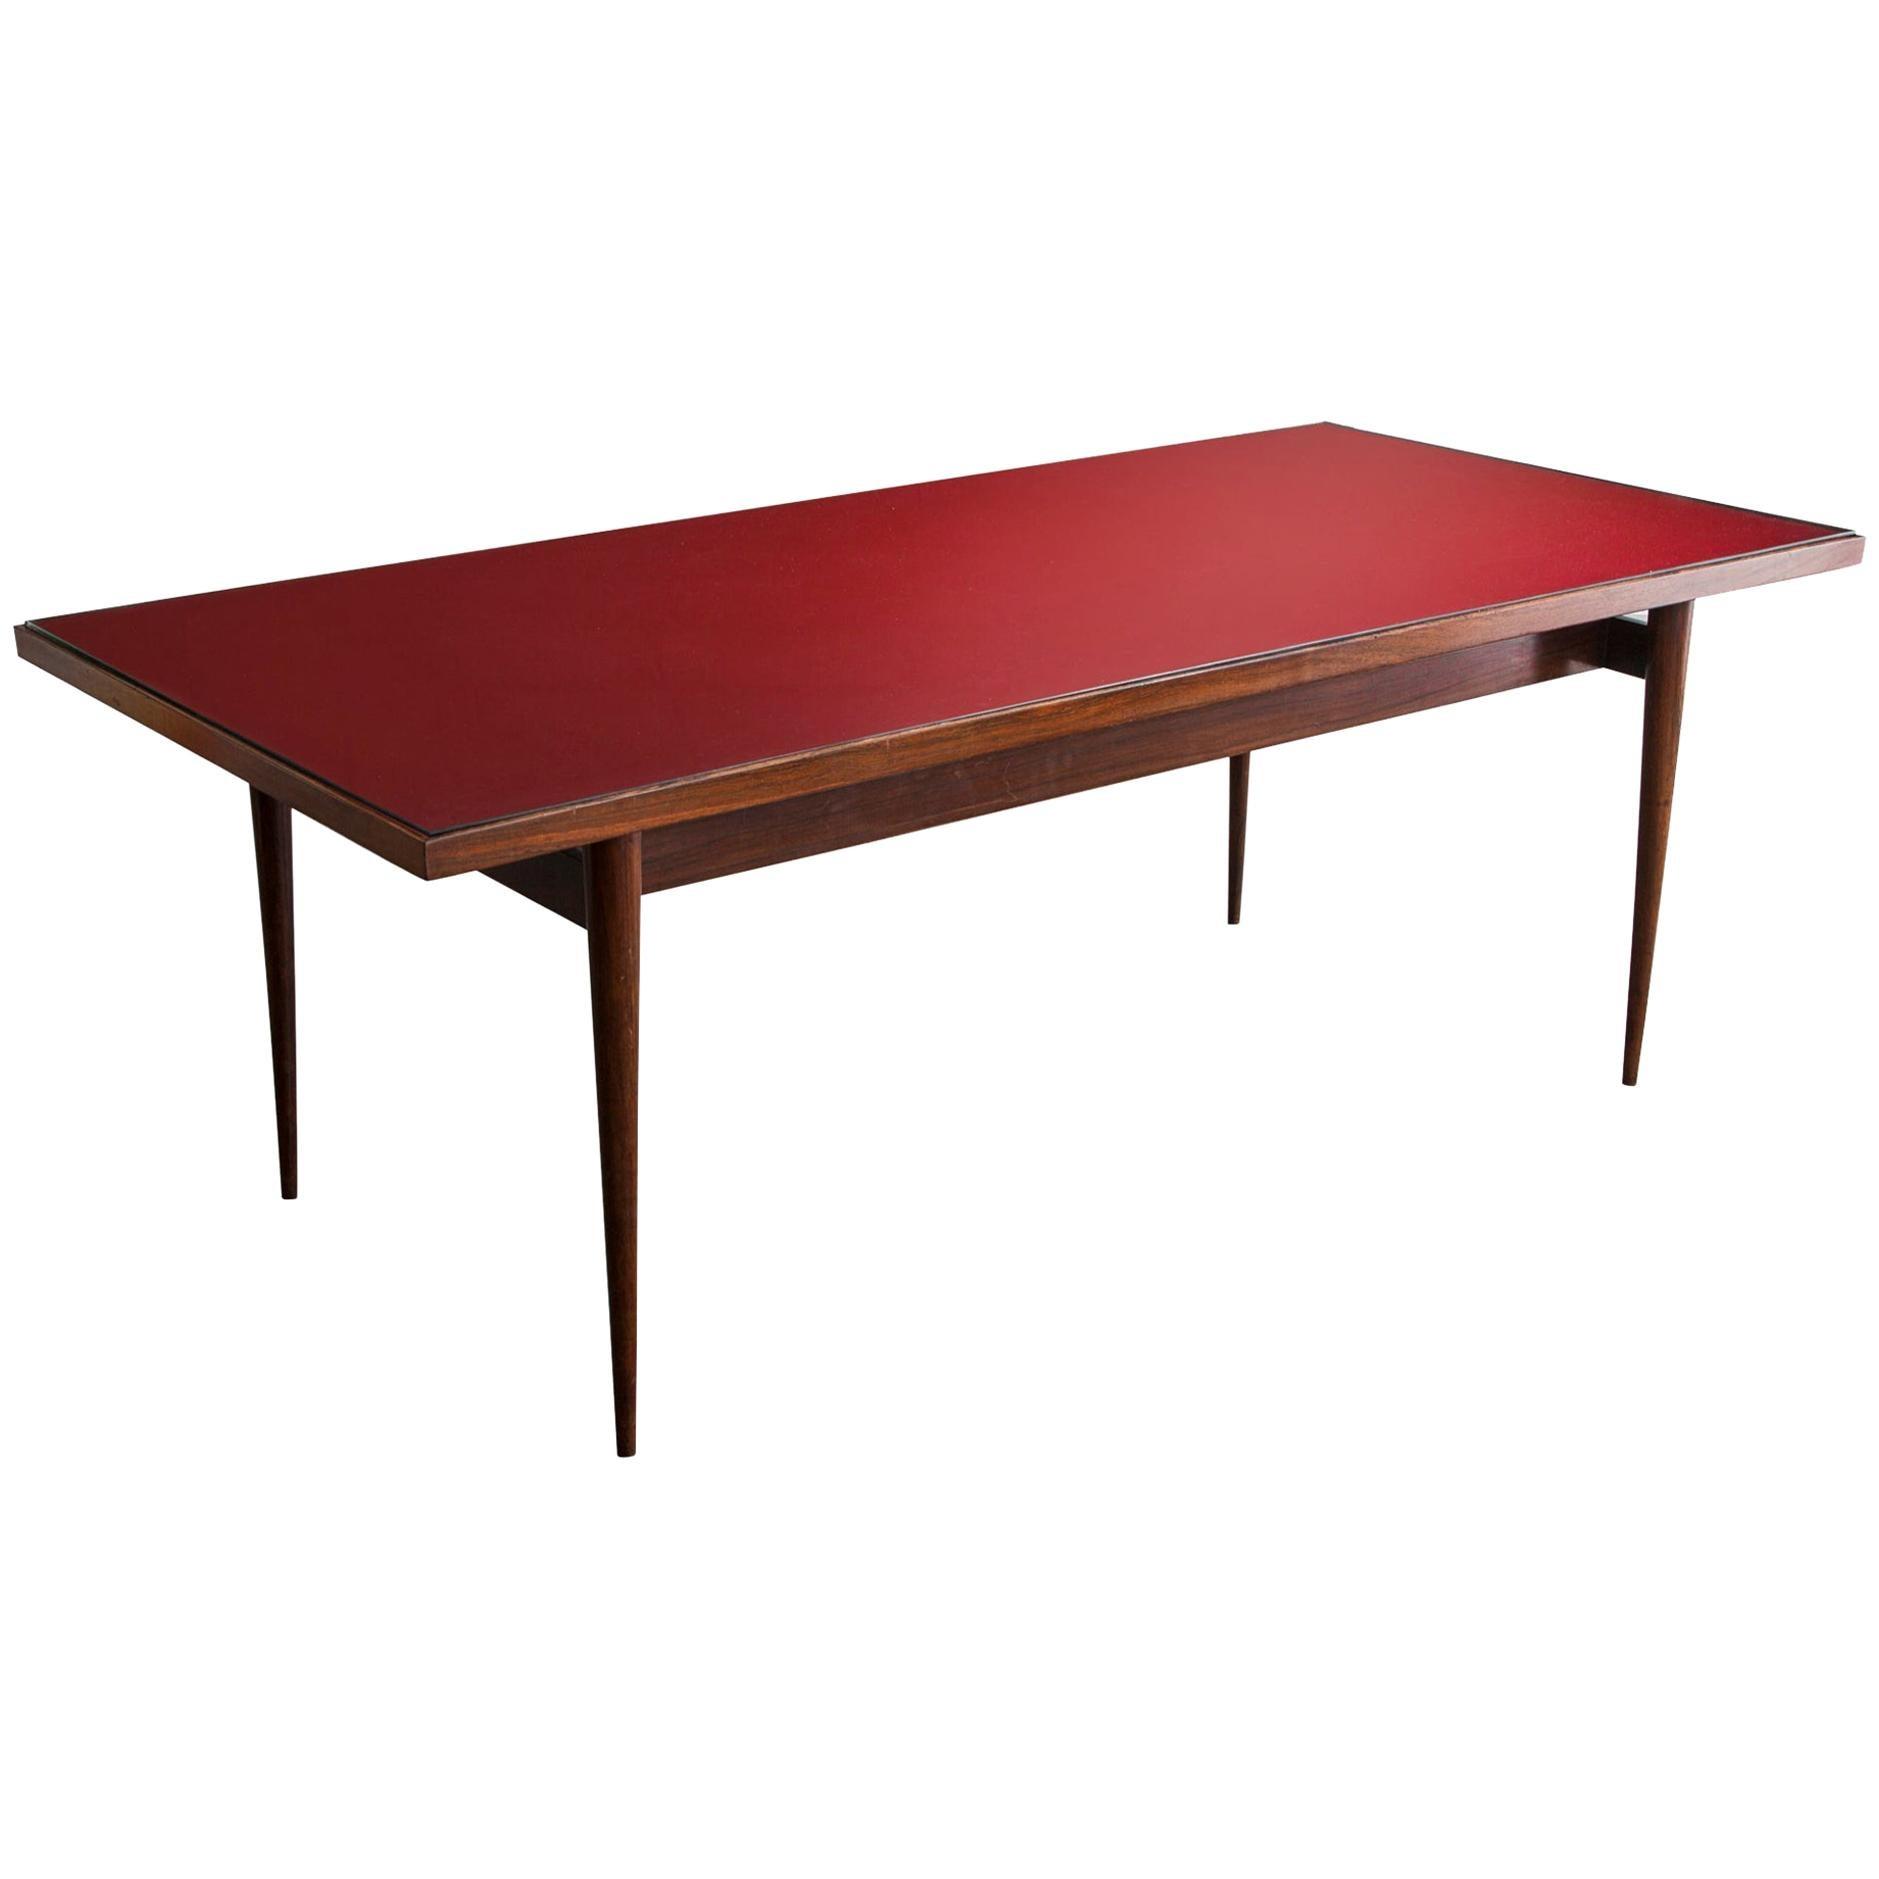 Rosewood Dining Table by Joaquim Tenreiro, 1948